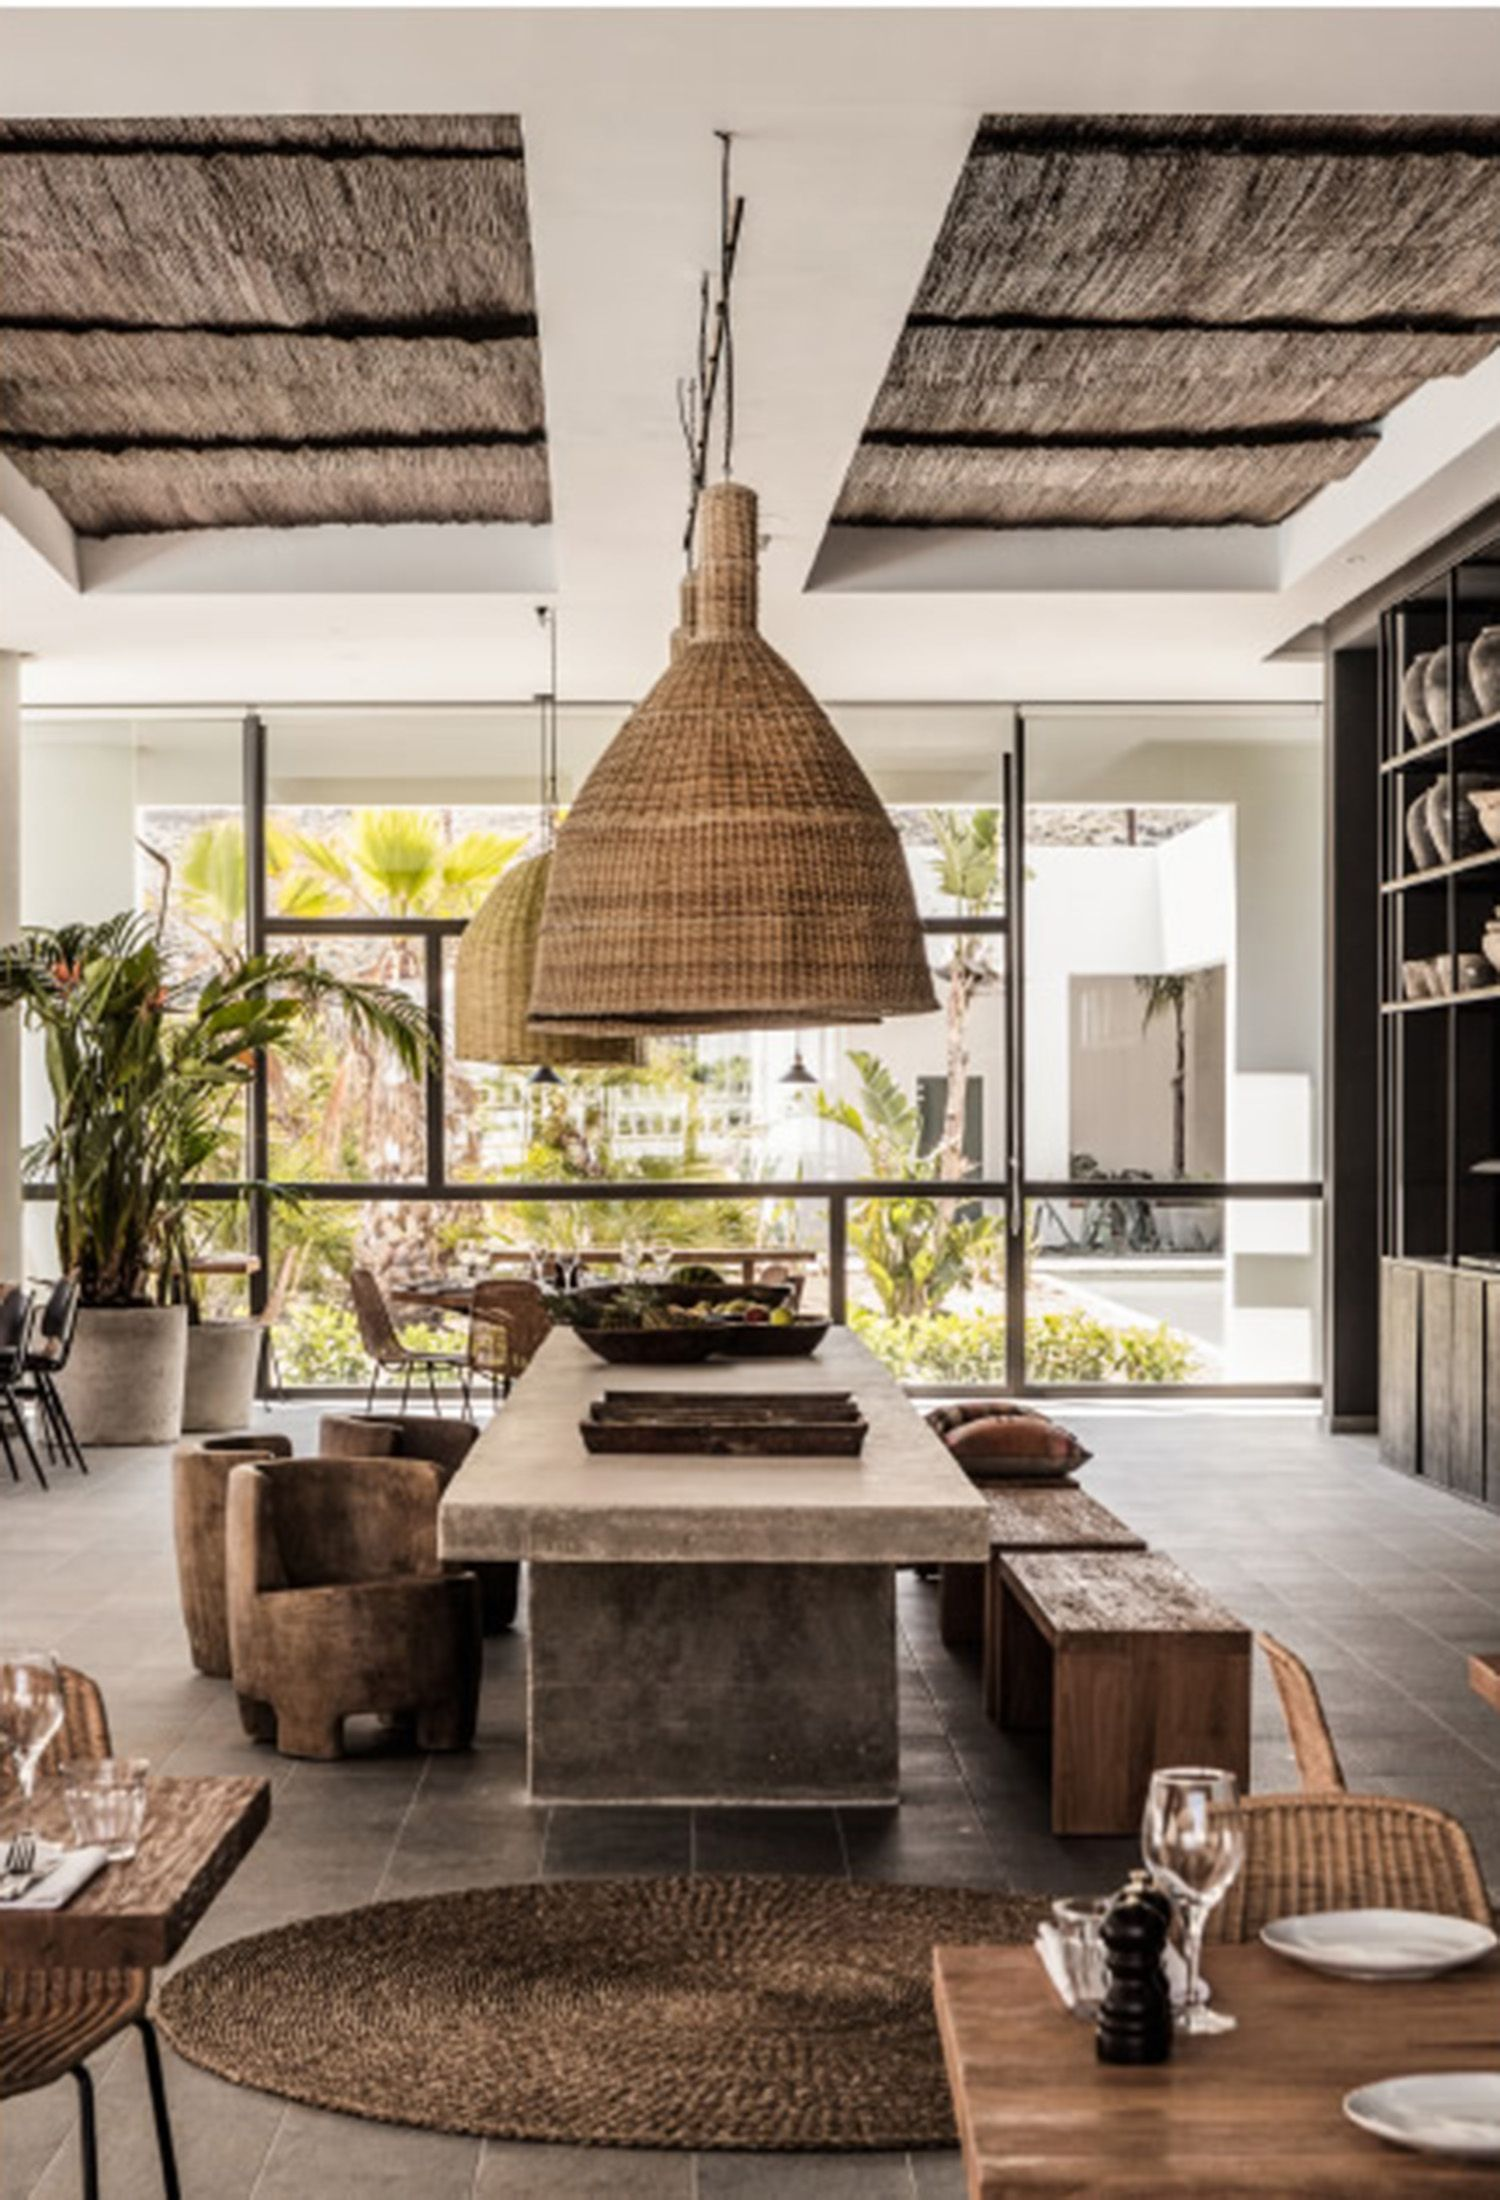 Casa Cook  Interiors  African interior design House design Home